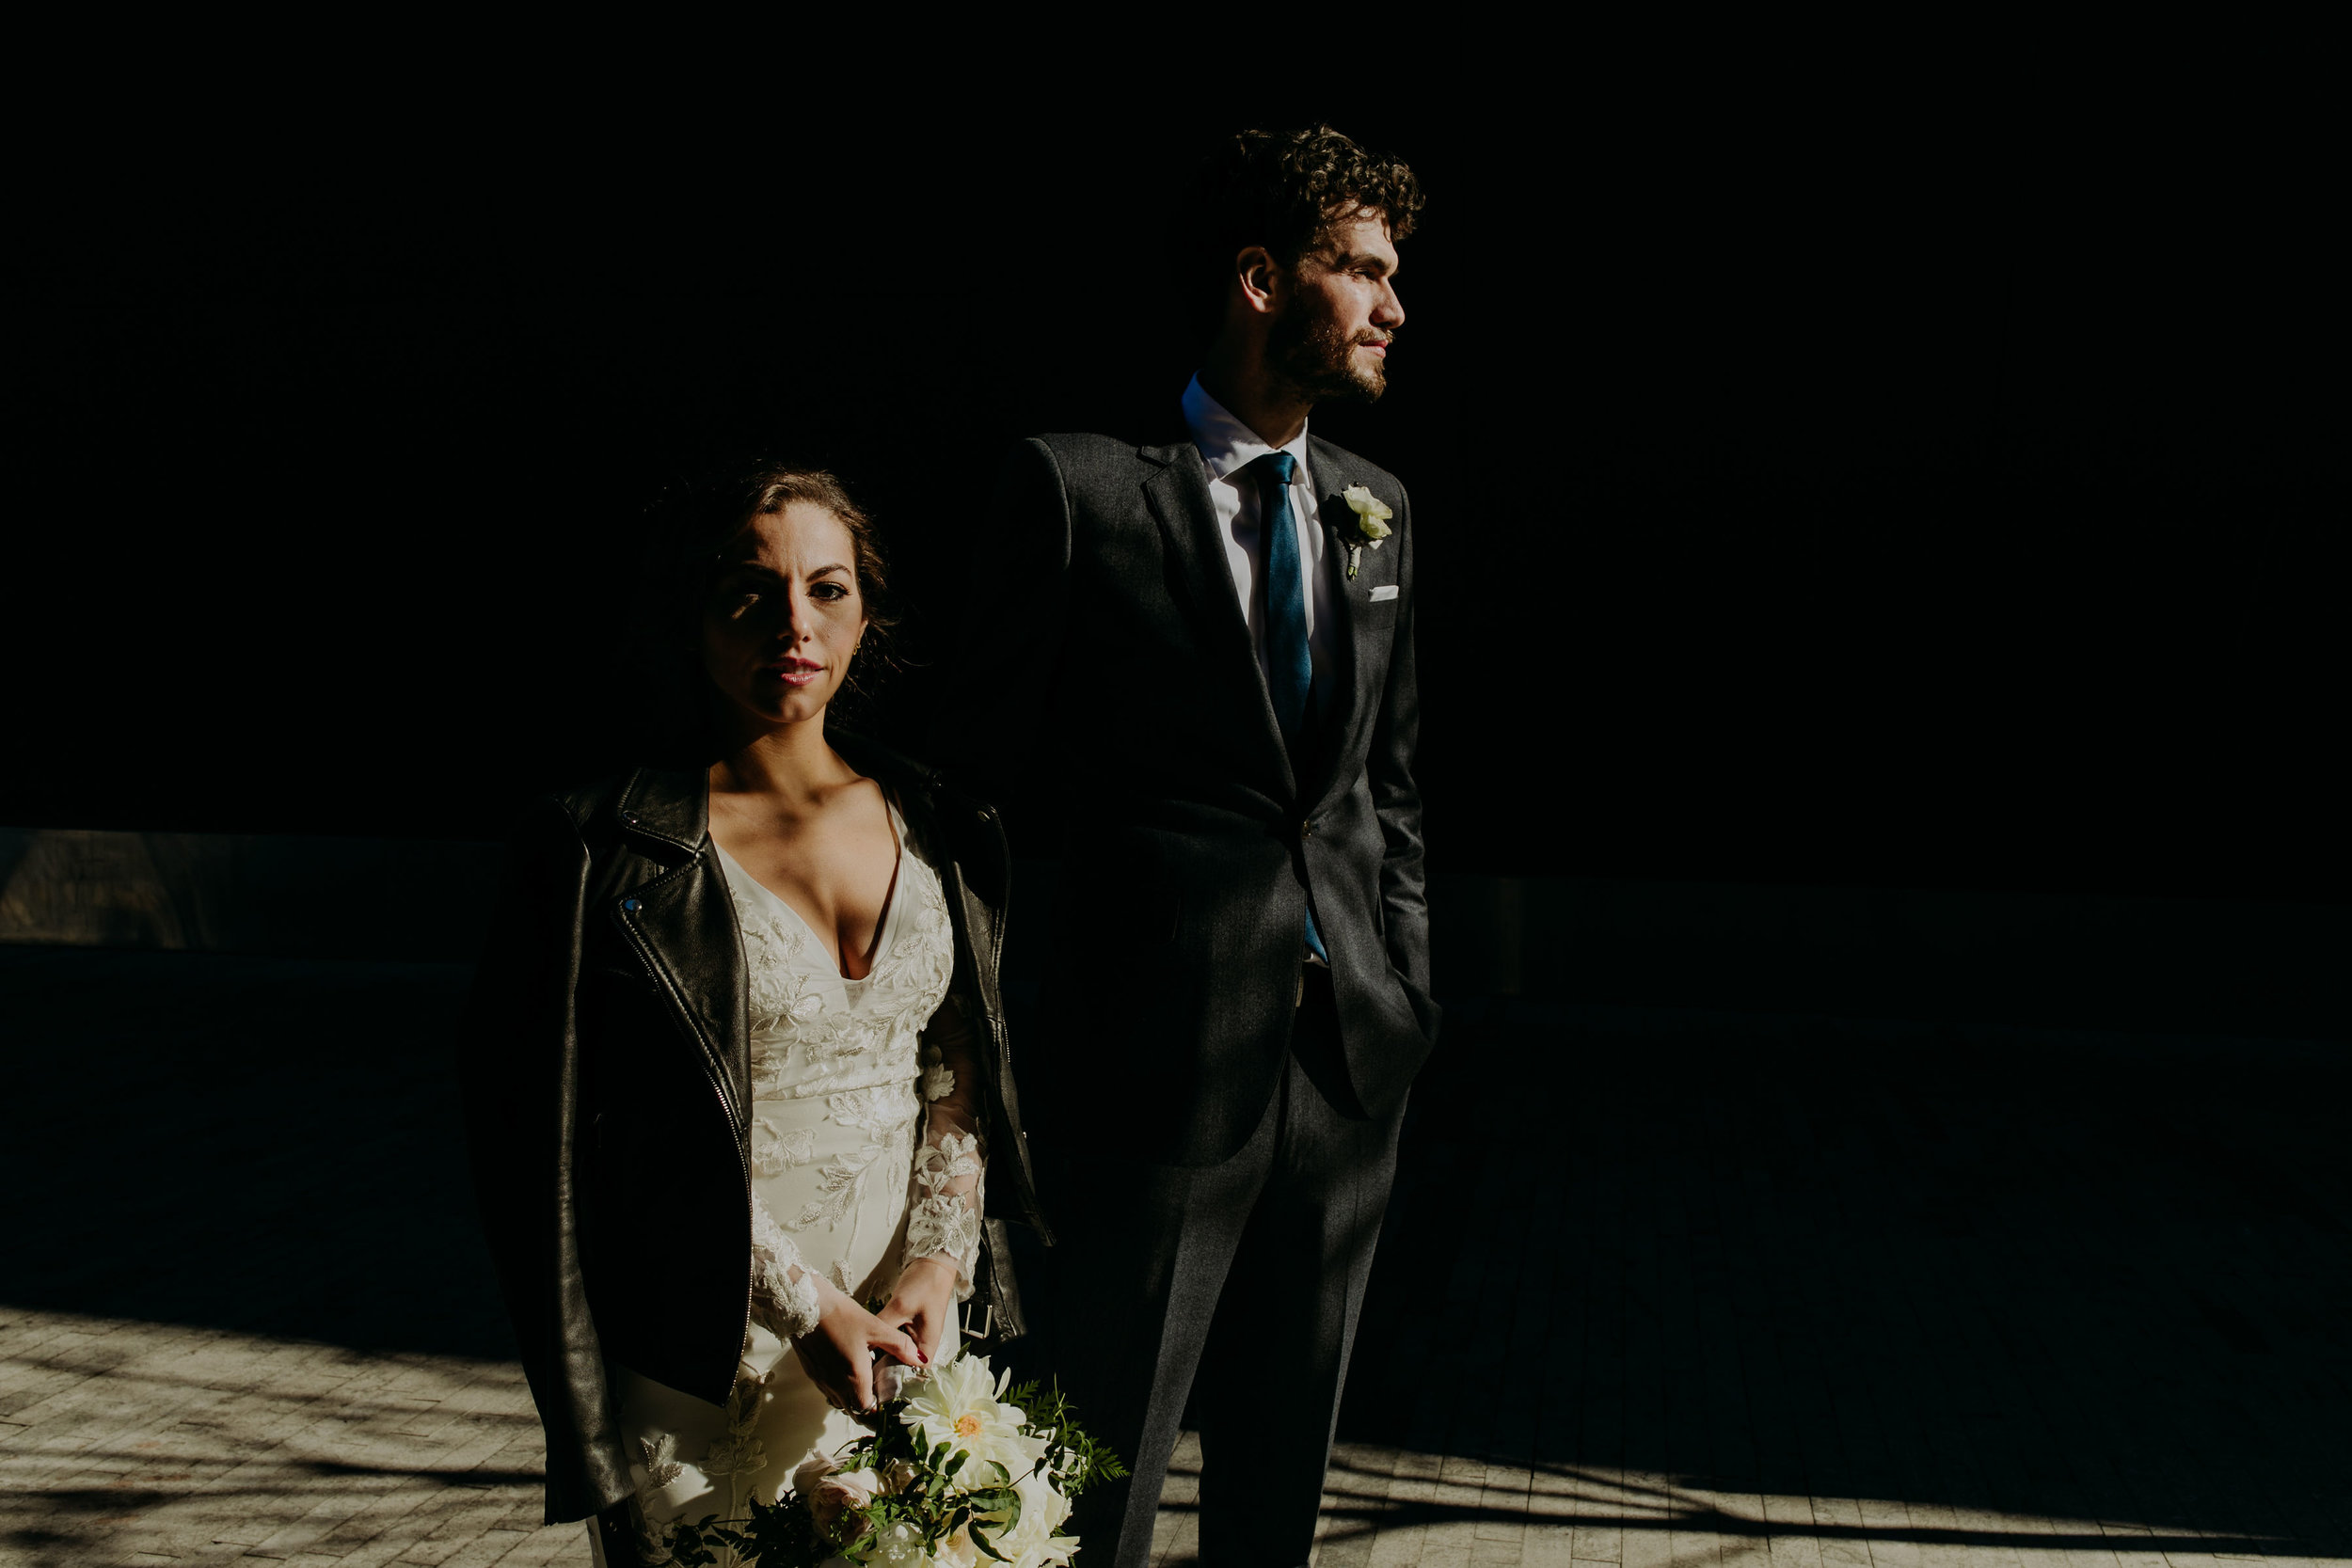 wythe-hotel-wedding-photographer-amber-gress-0117.jpg